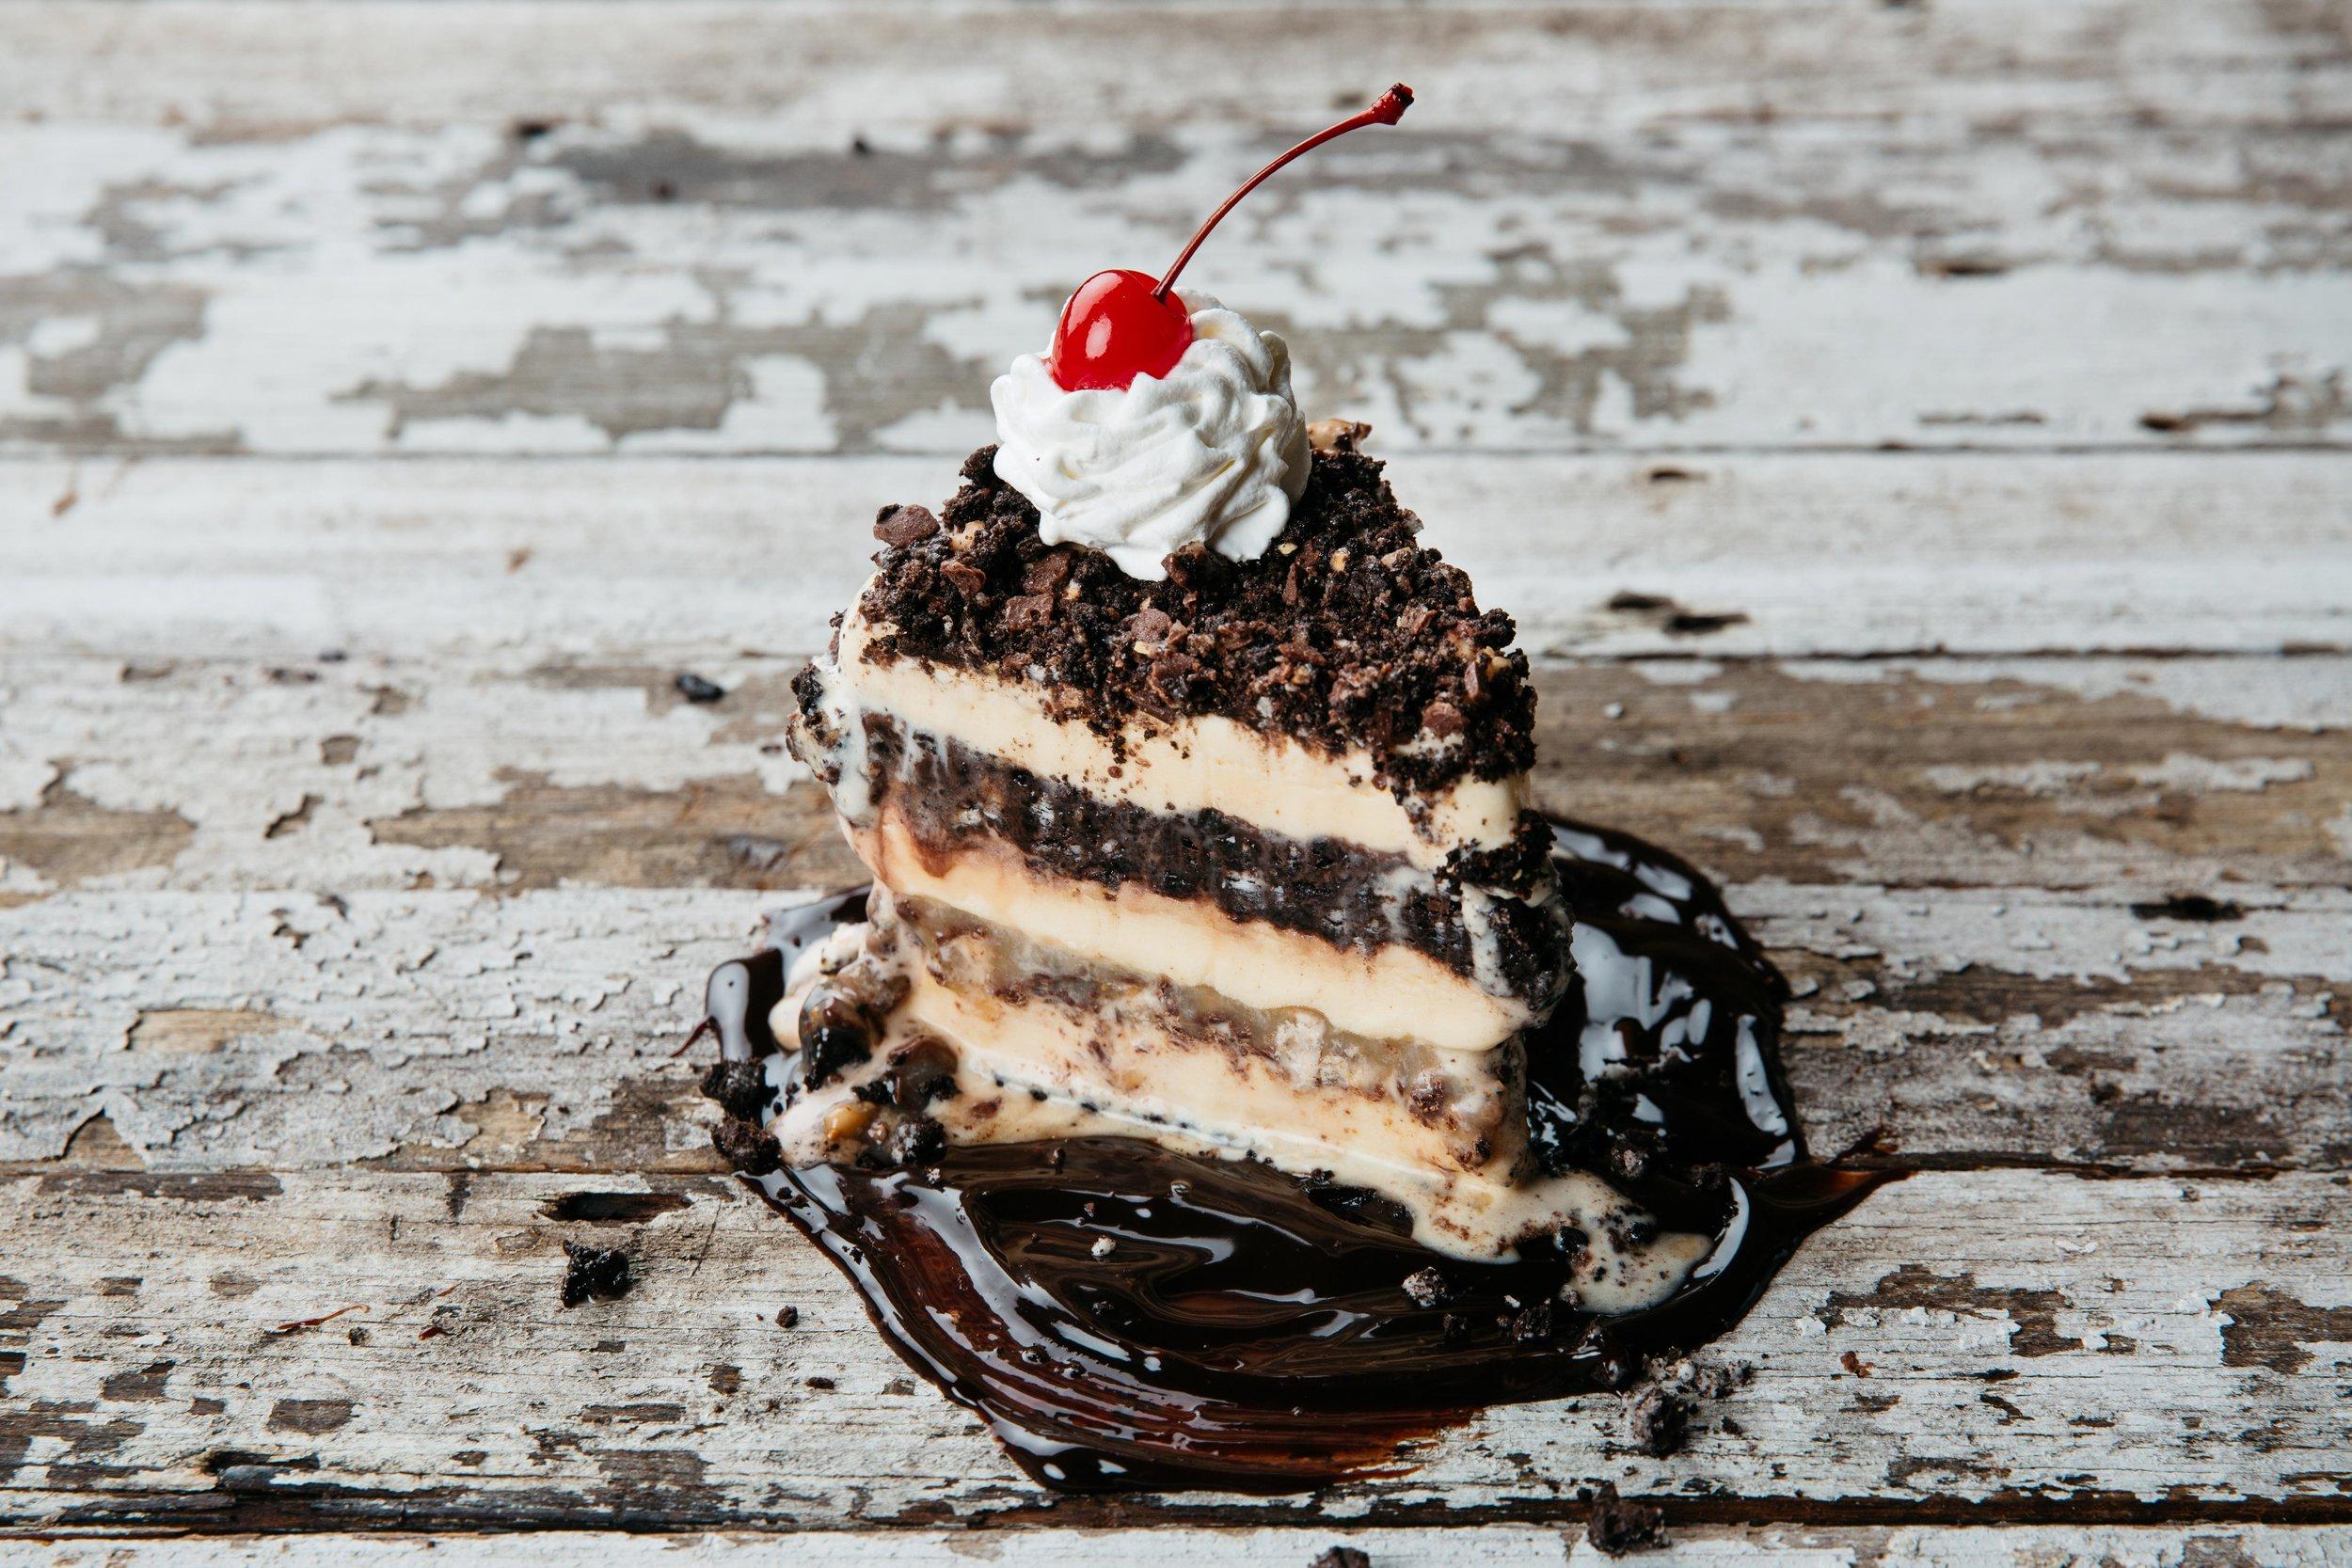 PatrickMichaelChin_Miller'sAleHouse_Food_Photography-5.jpg